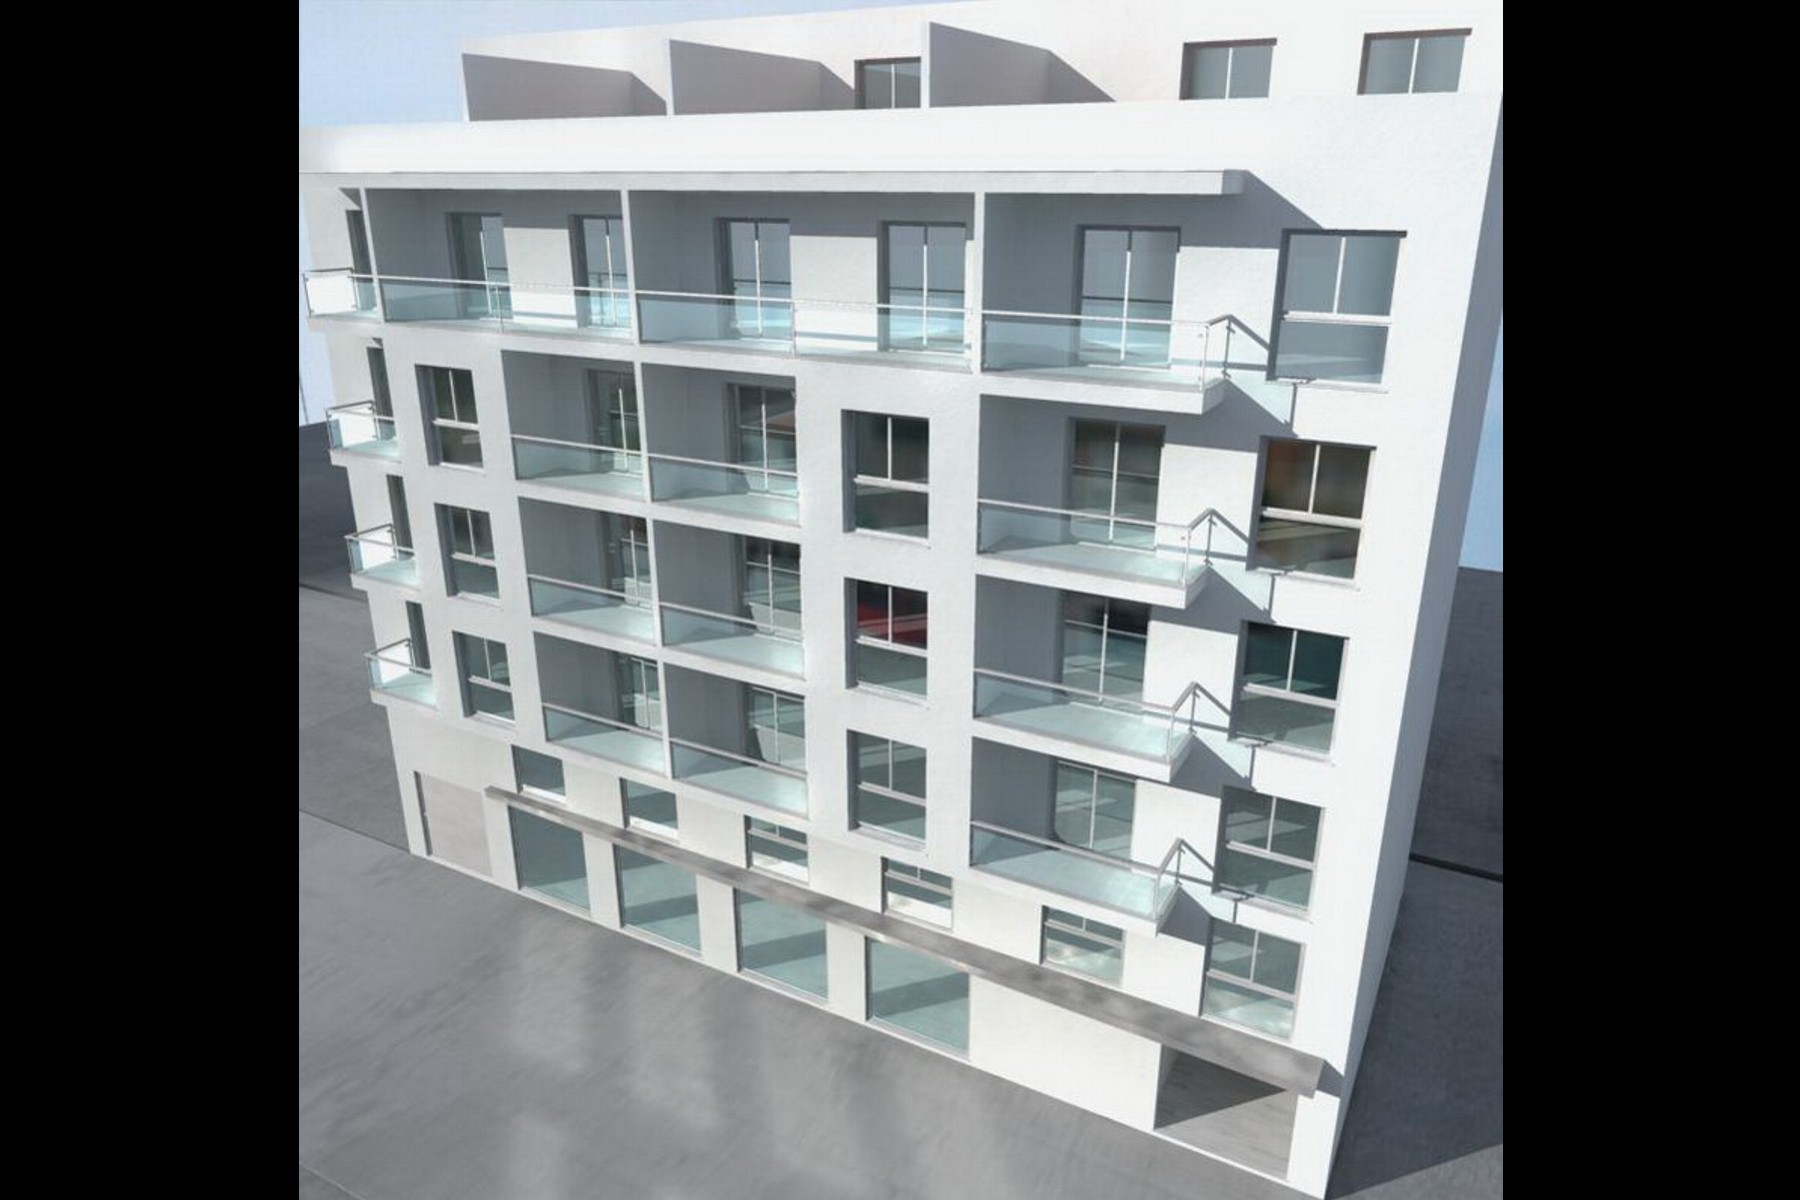 Imaginarq-042-edificio-viviendas.-Pego.-Alicante.10A